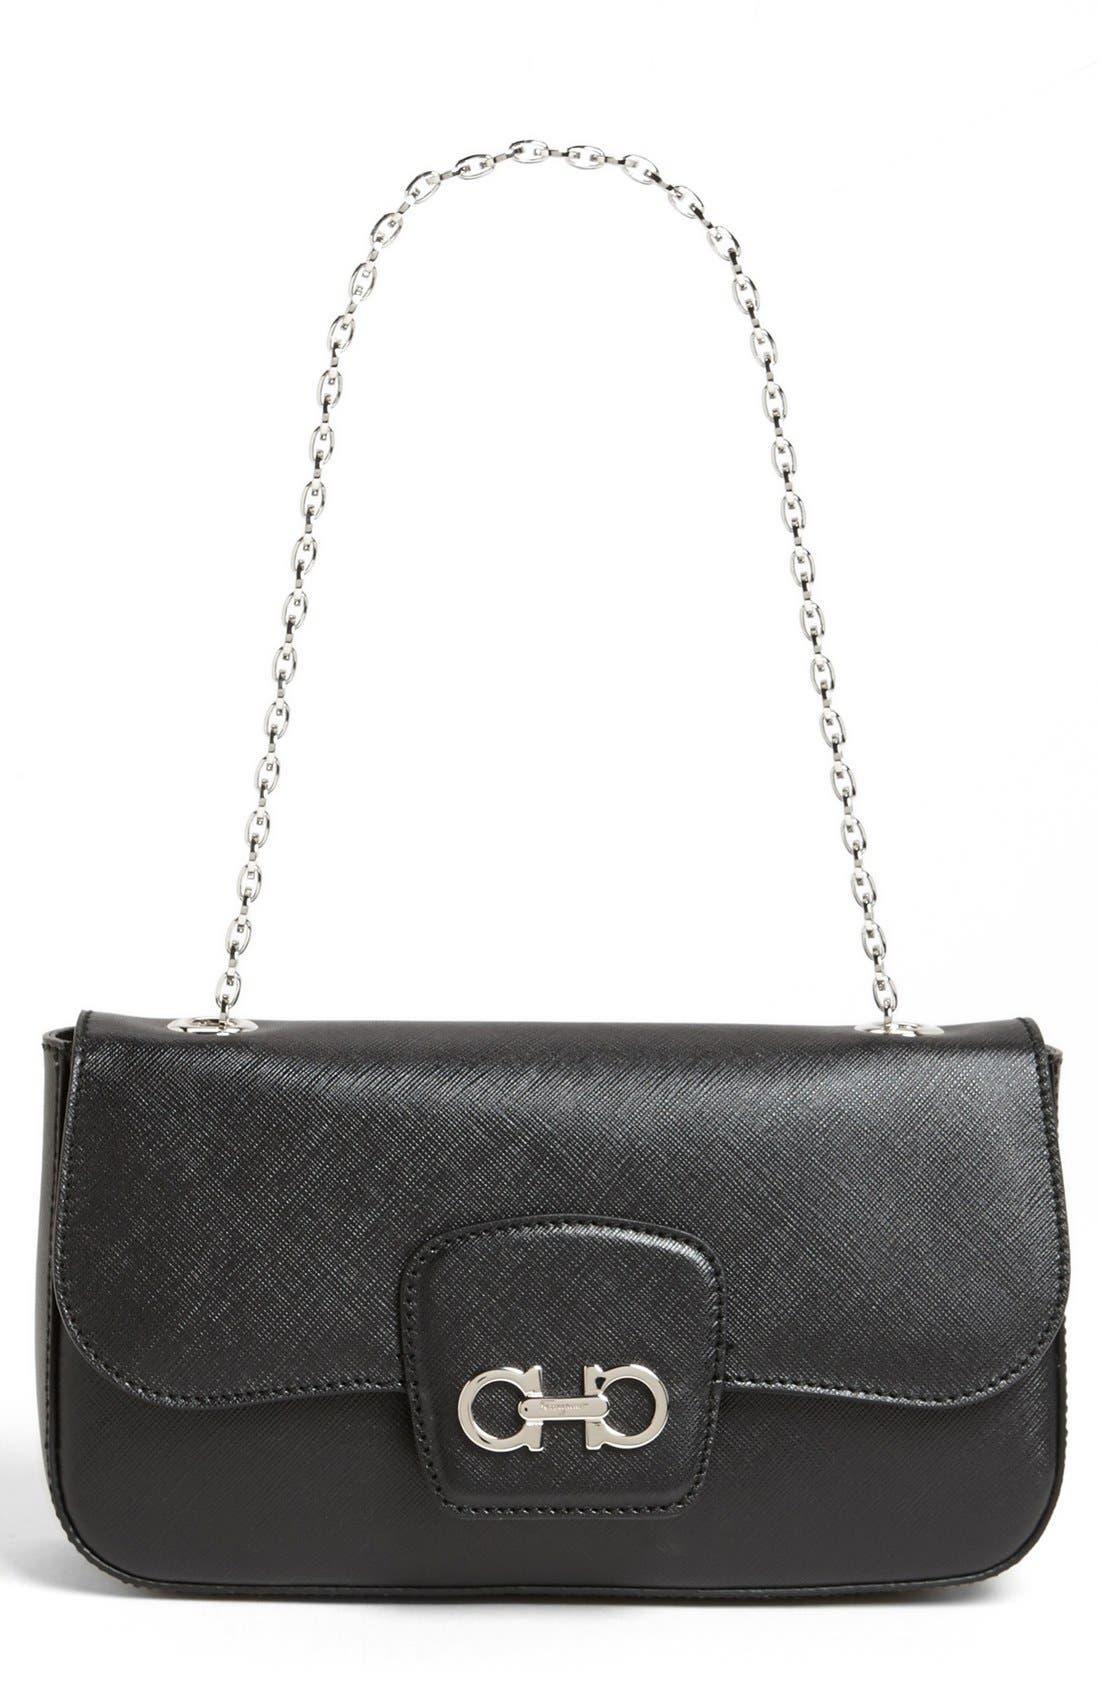 Main Image - Salvatore Ferragamo 'Rory' Leather Shoulder Bag